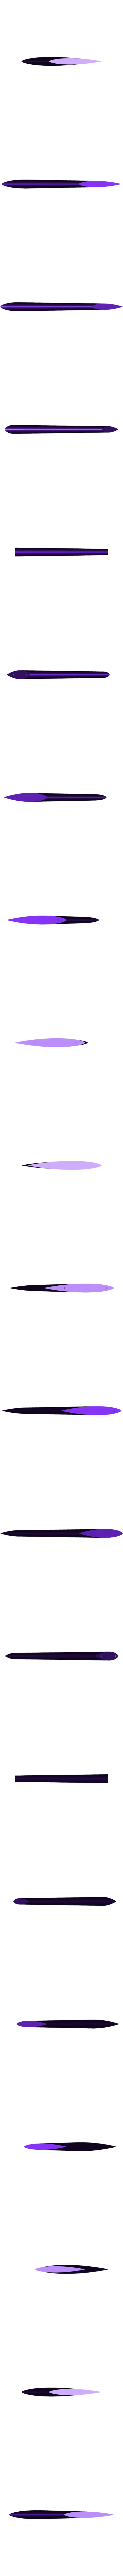 fin.stl Download free STL file Speedy Red Midi Wing • Design to 3D print, wersy